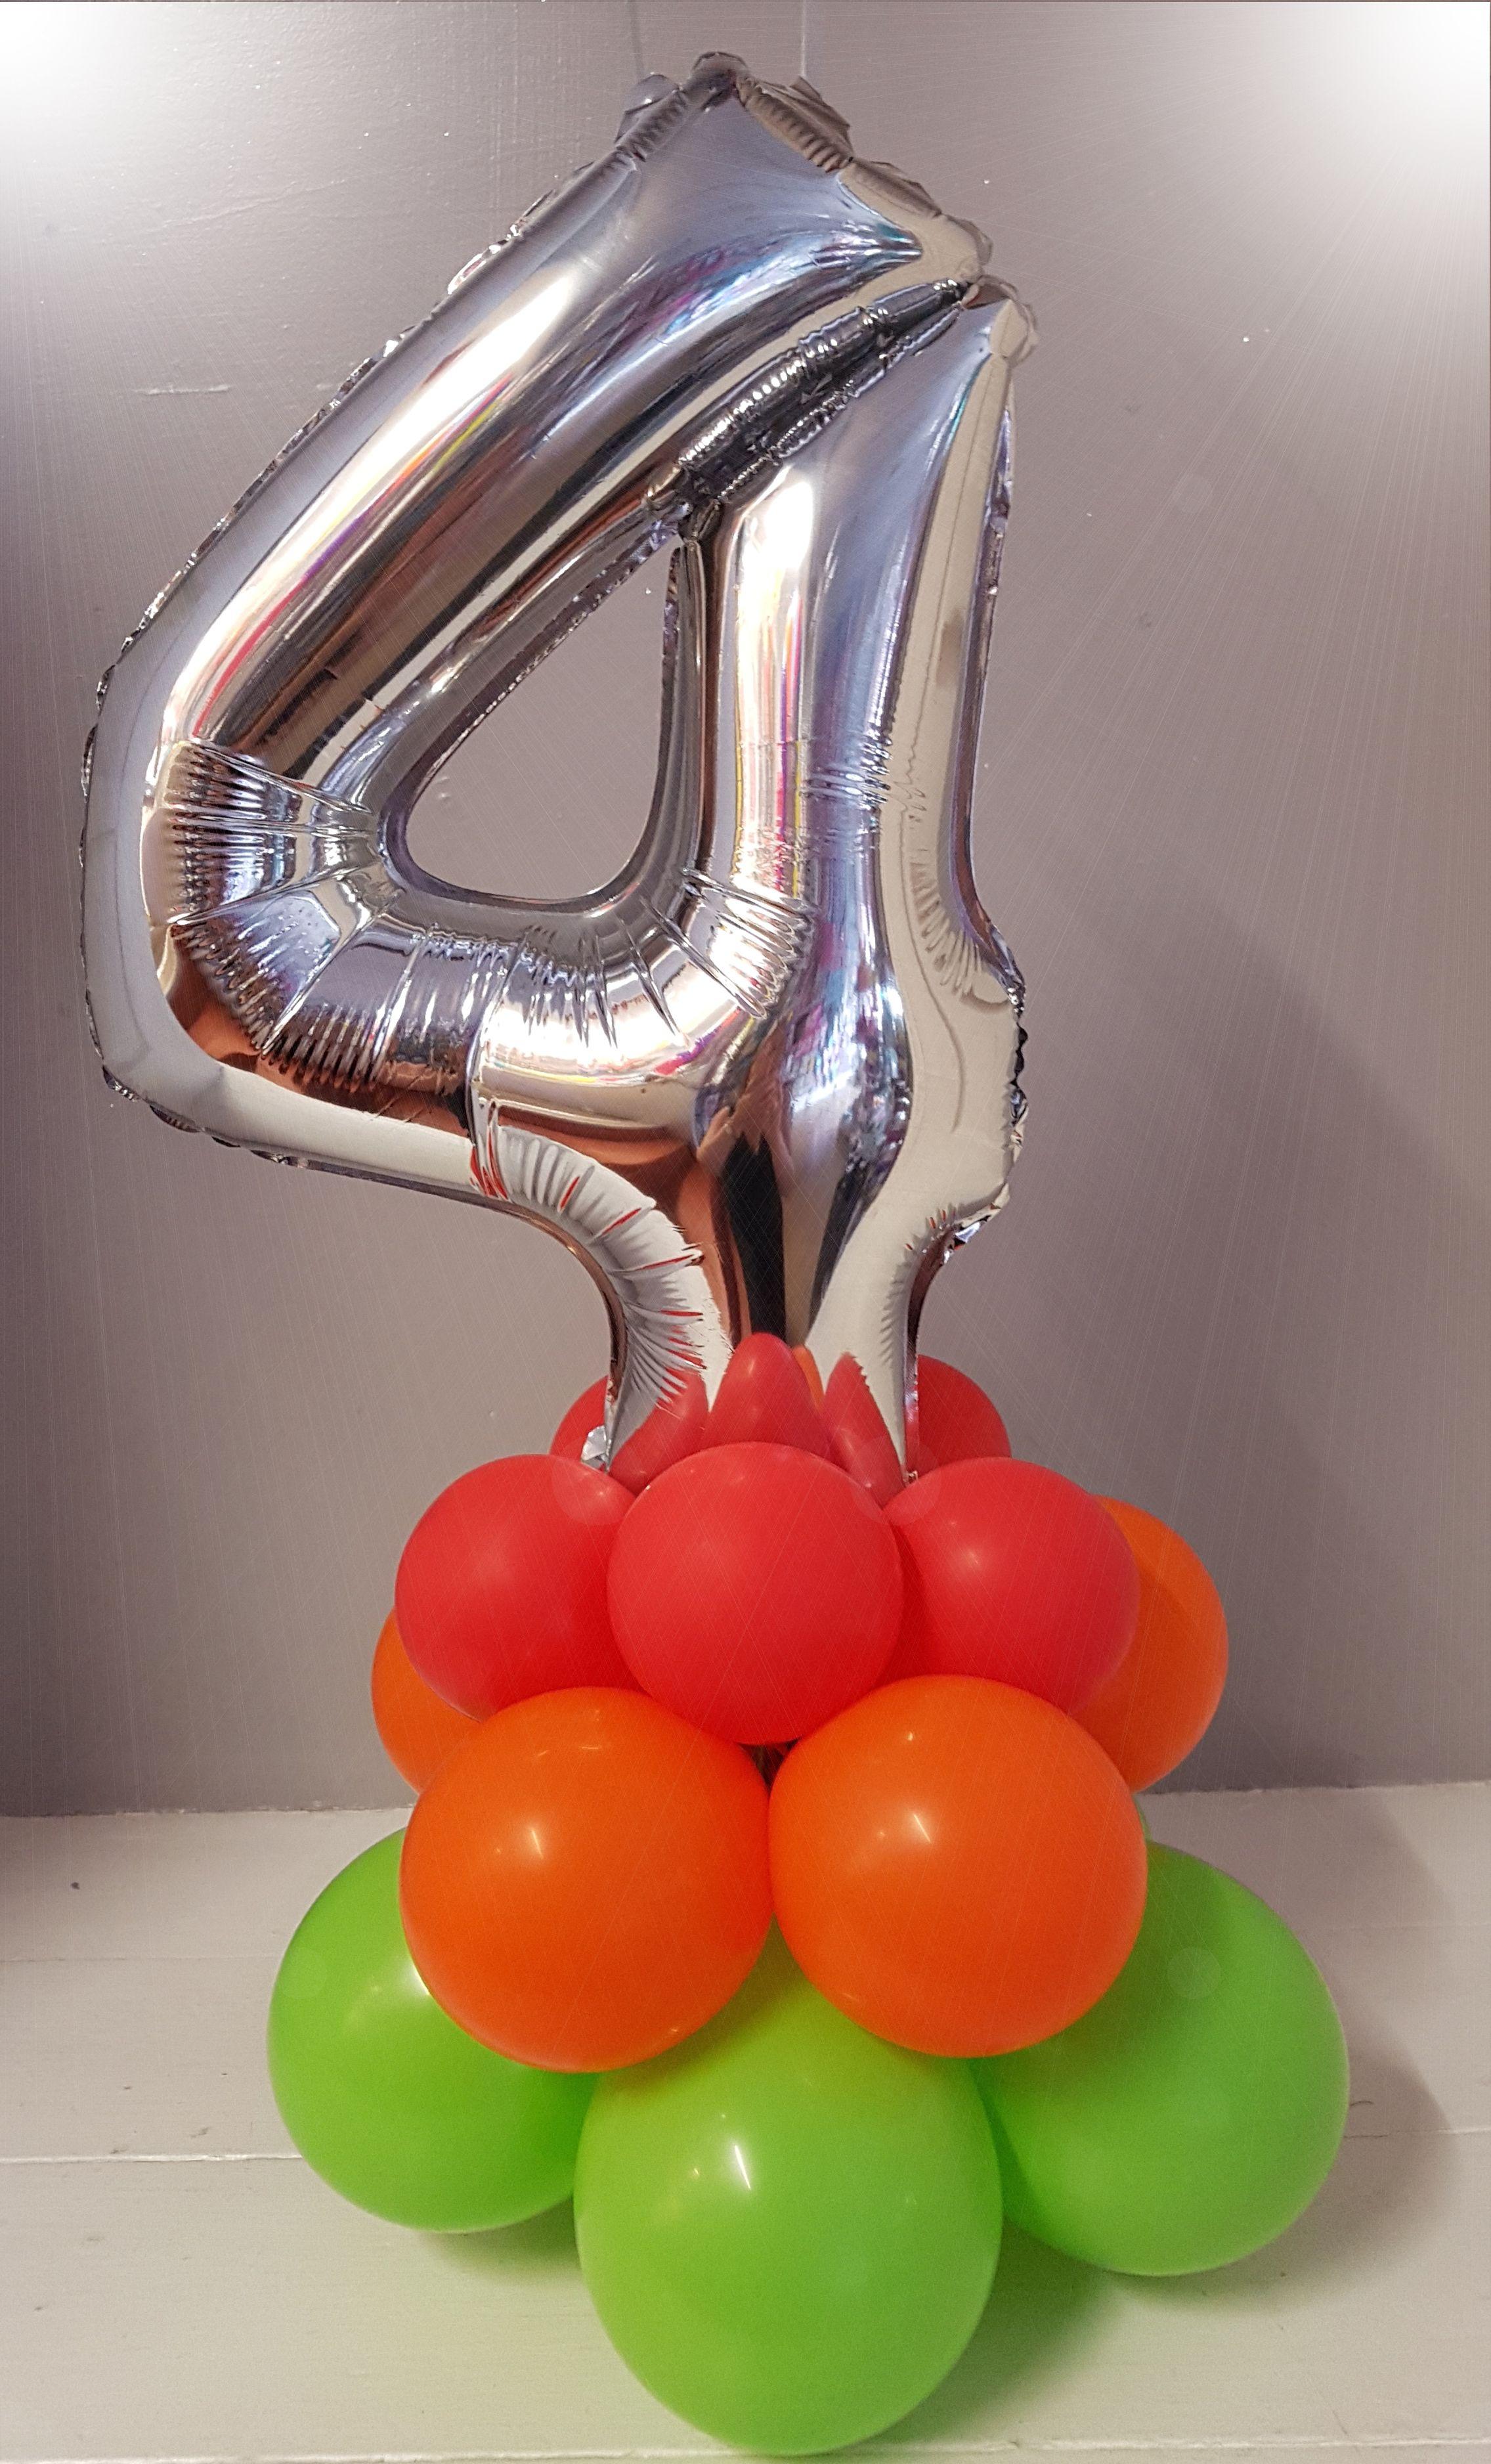 Balloon Centrepiece Age 4 Arrangements Centerpieces Decorations Happy Birthday